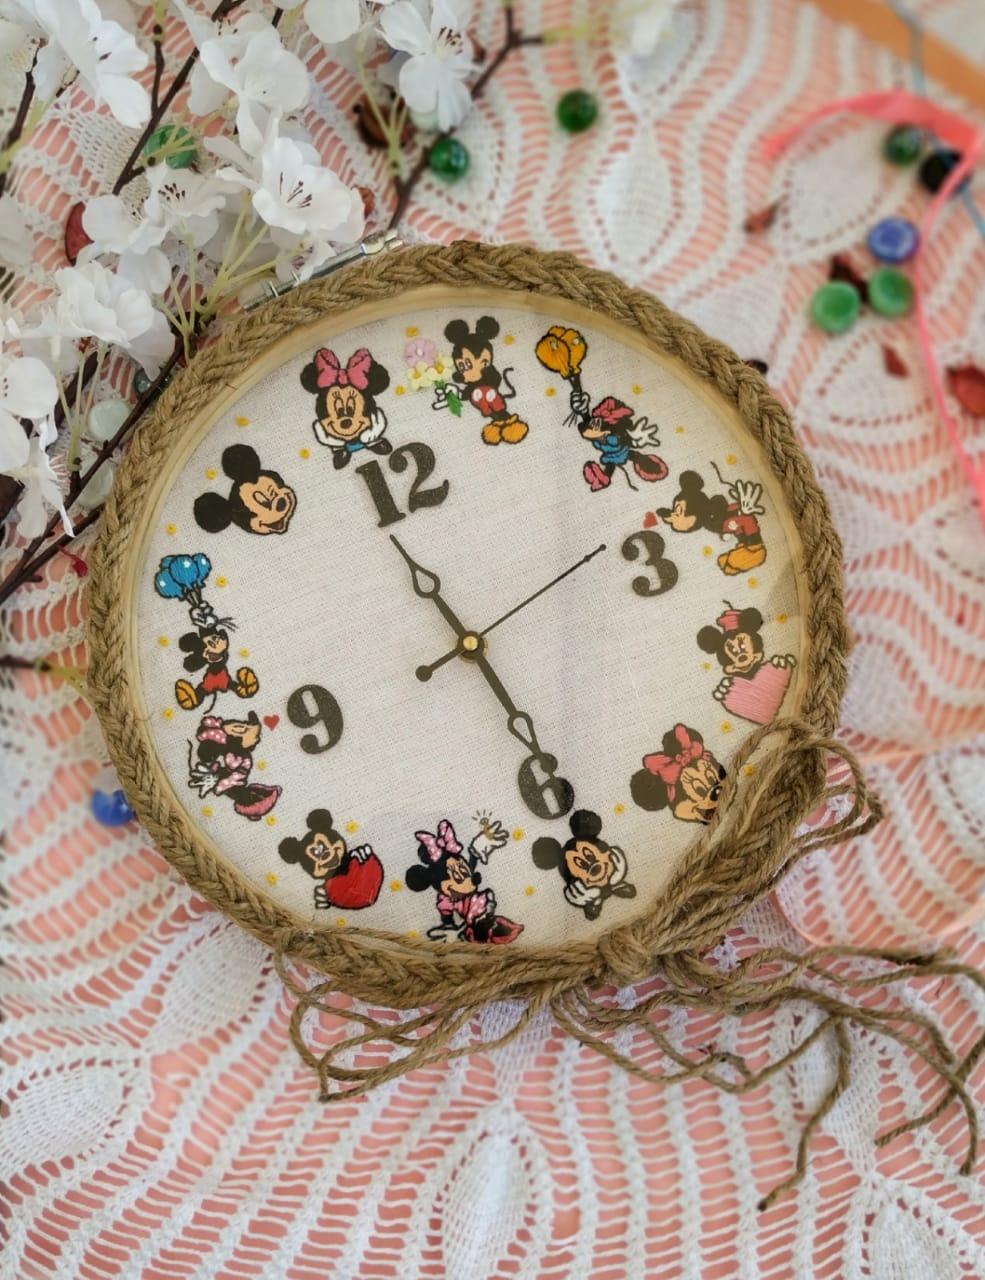 Hand Embroidered Framed Clocks  Mickey Minnie  Hand Embroidered Framed Clocks  Mickey Minnie1